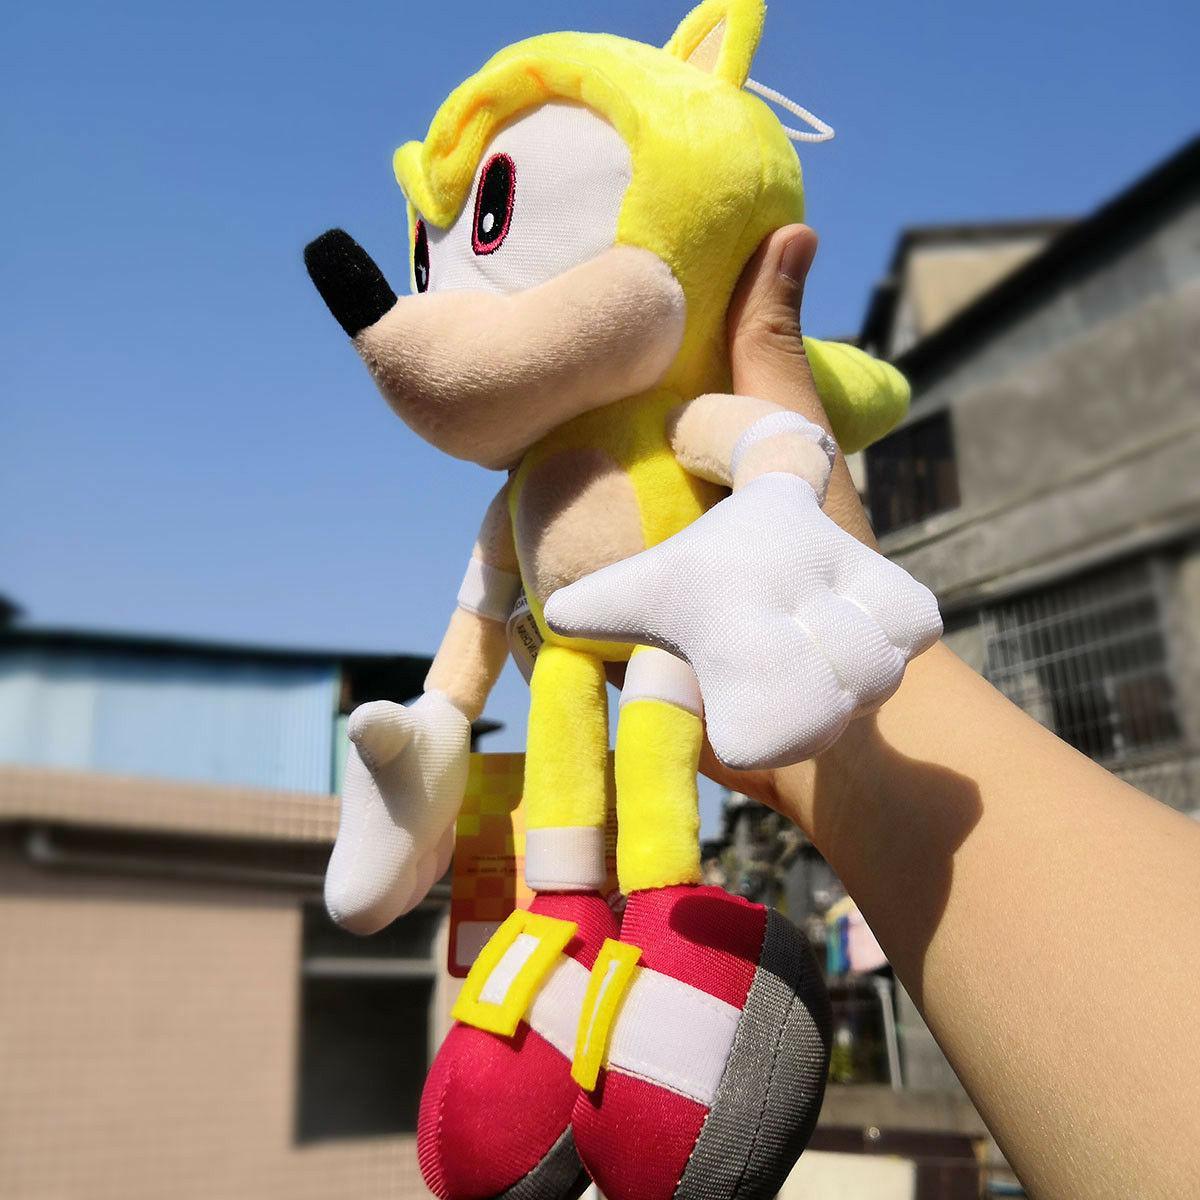 Super The Hedgehog Tails Animal inch